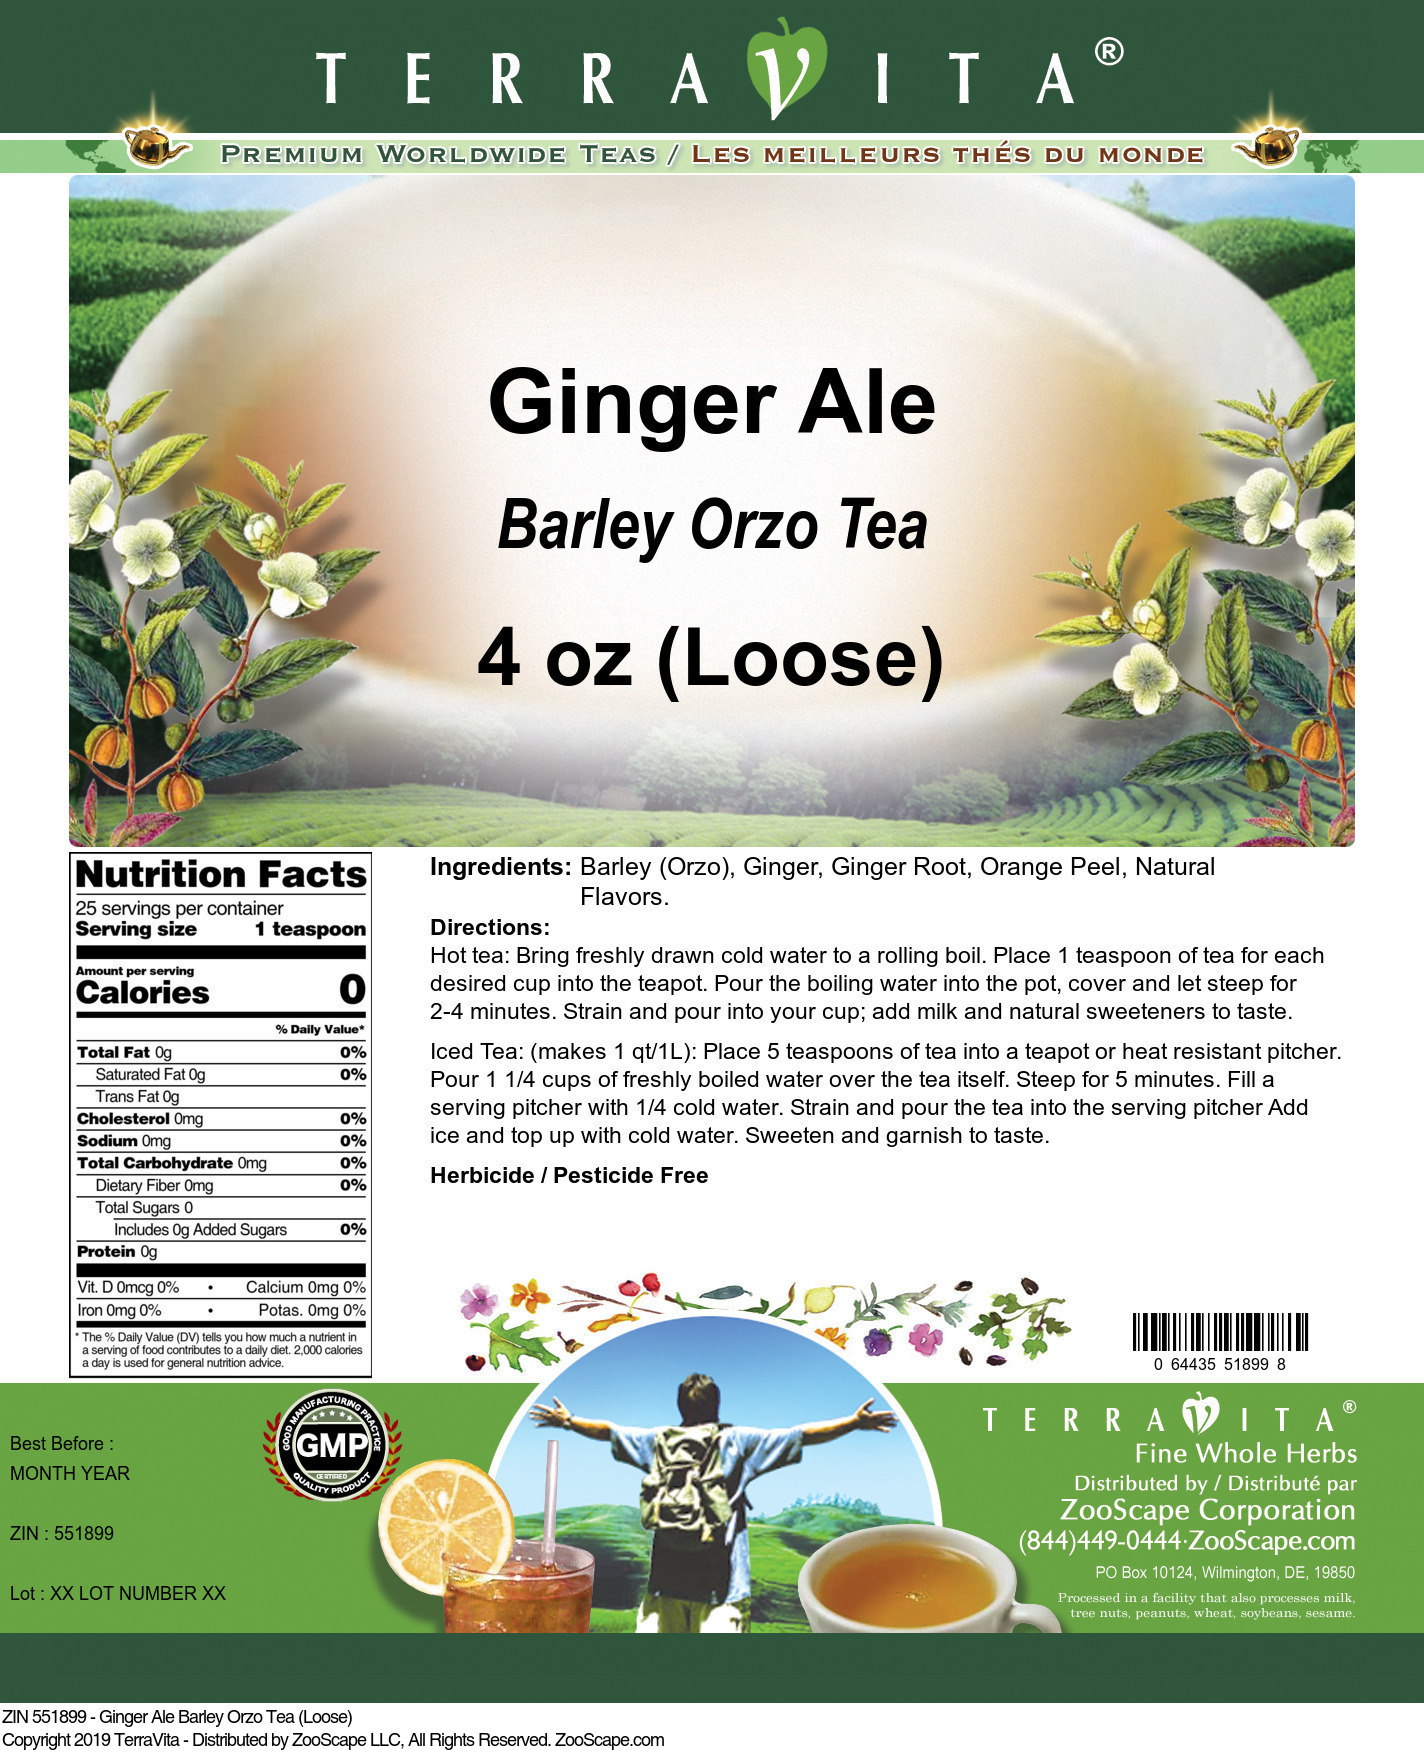 Ginger Ale Barley Orzo